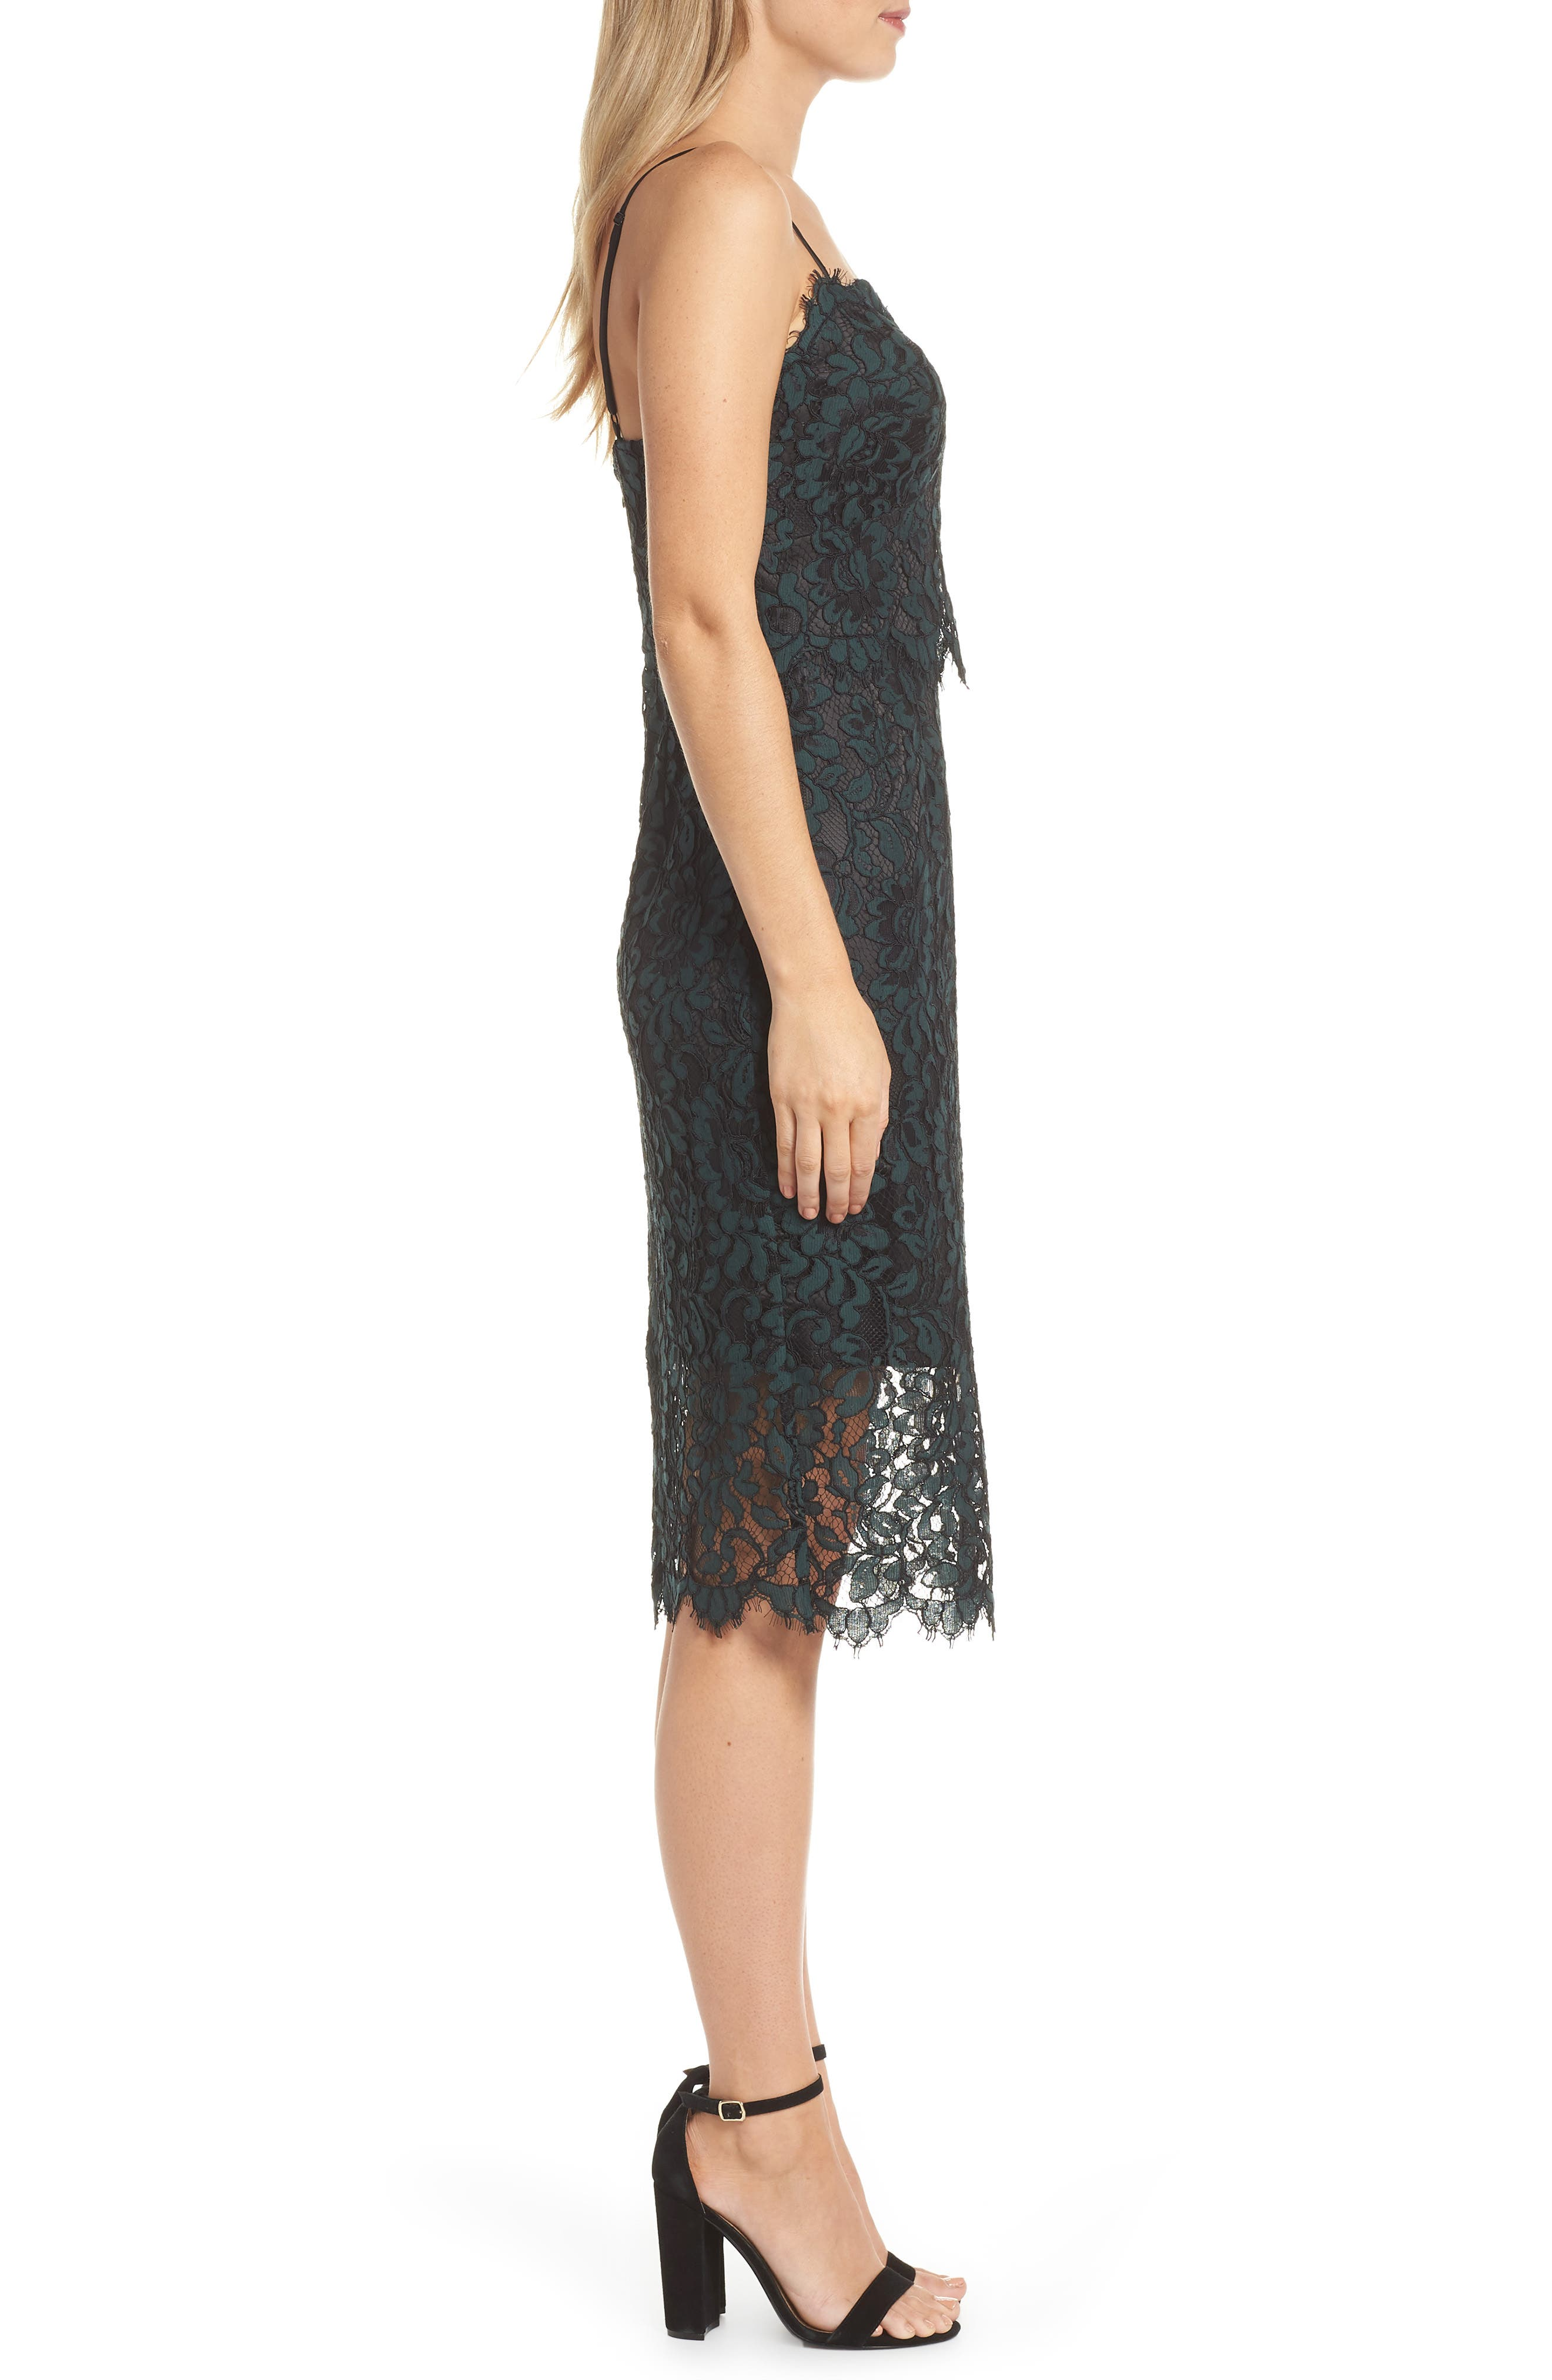 ELIZA J, Sweetheart Neck Lace Sheath Dress, Alternate thumbnail 4, color, 310